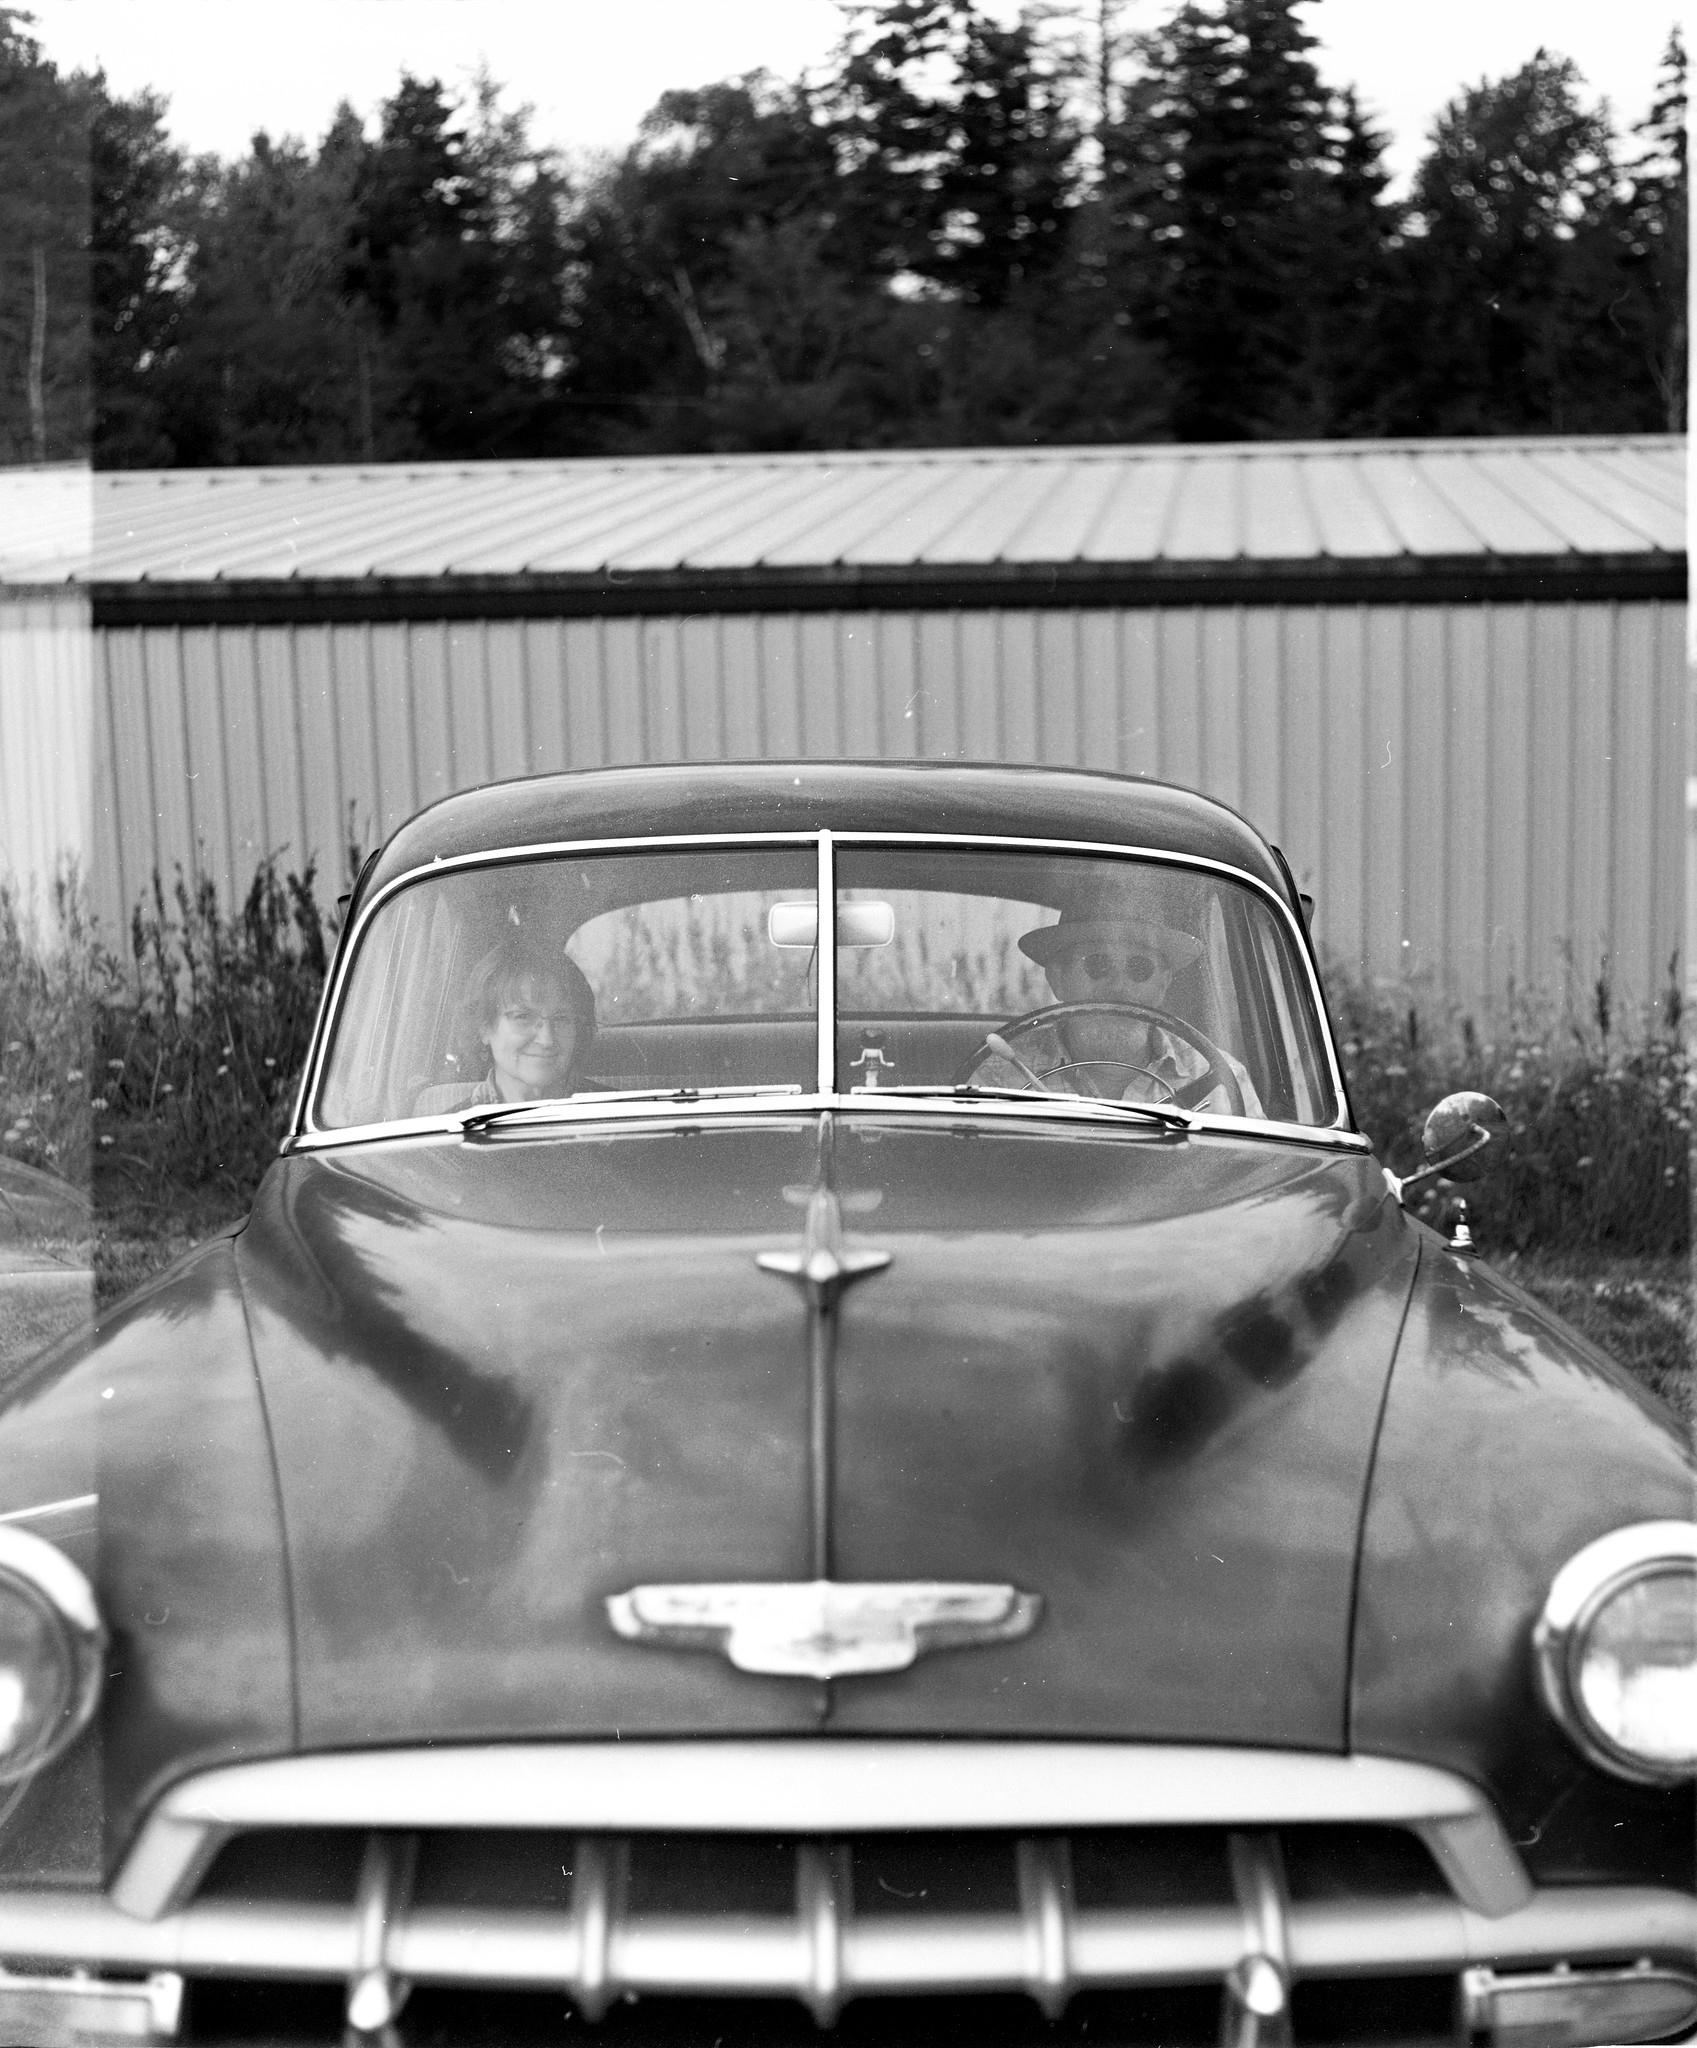 Vintage Couple in a Vintage Car